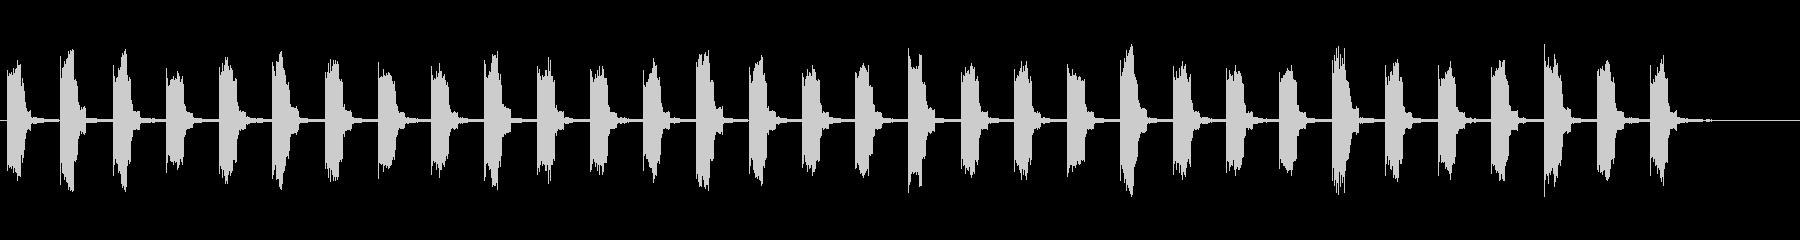 KANT 近未来時計カウント音12の未再生の波形